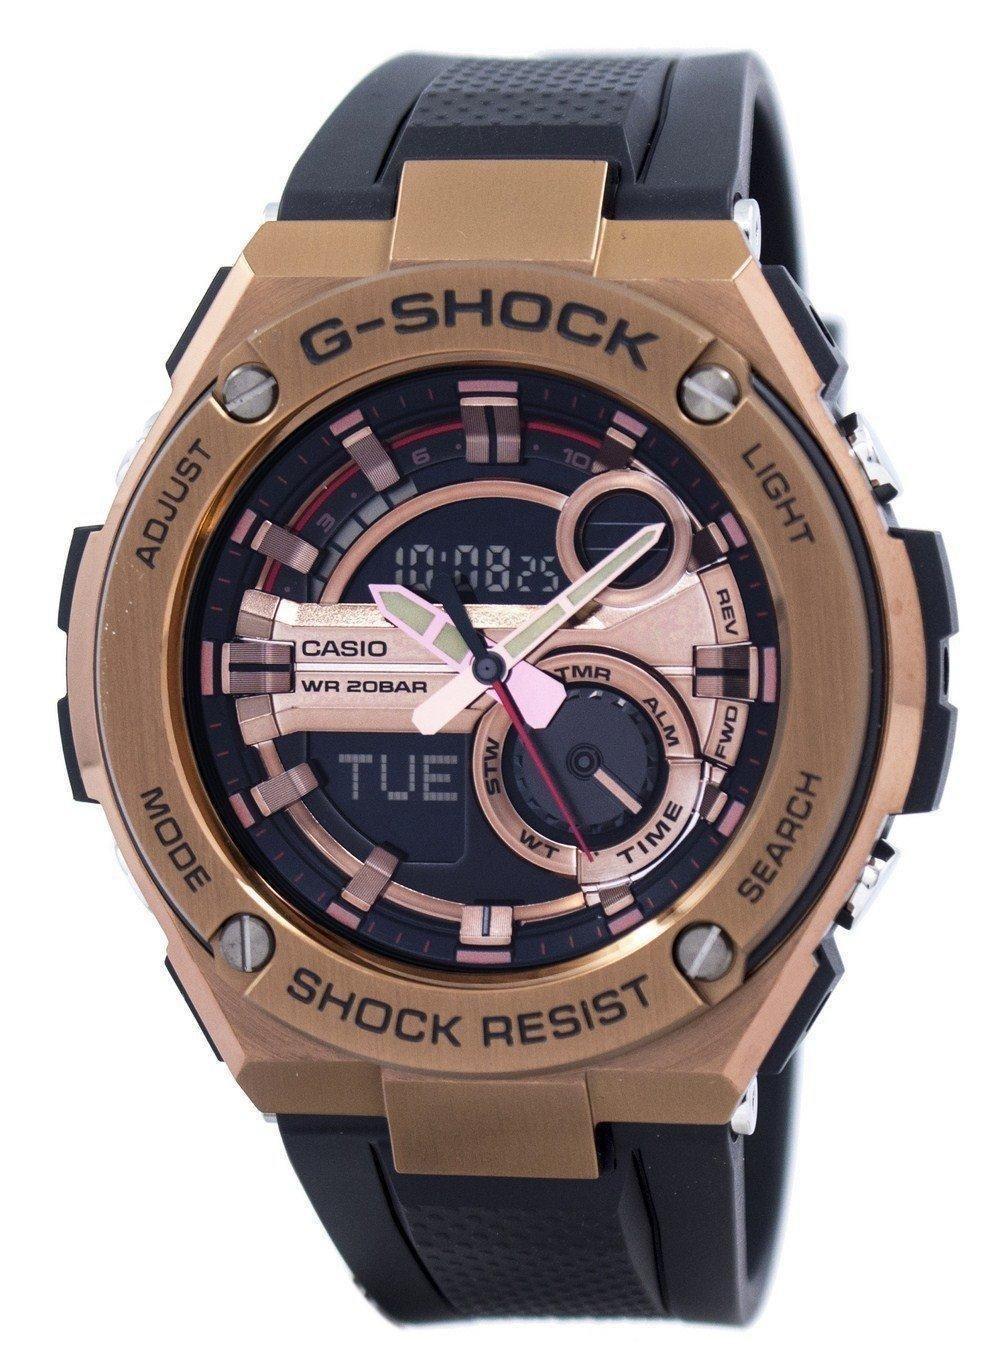 07972c1068eb Casio G-shock G-steel Analog Digital World Time Gst-210b-4a Men s Watch  (FREE Shipping)